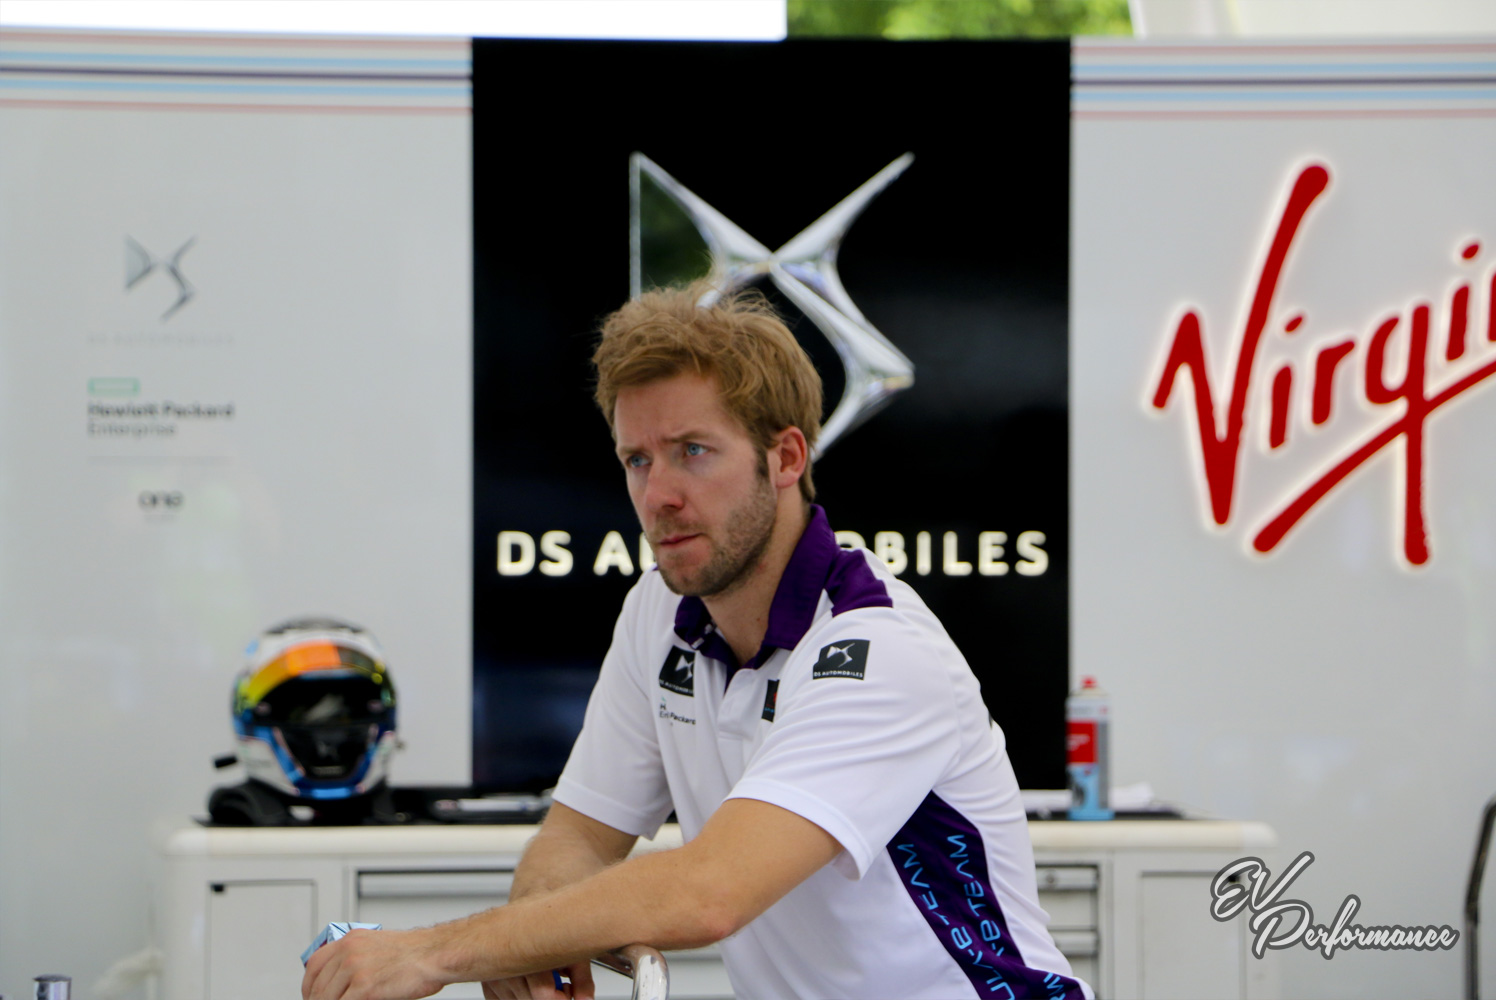 Sam Bird| Berlin Formula E ePrix